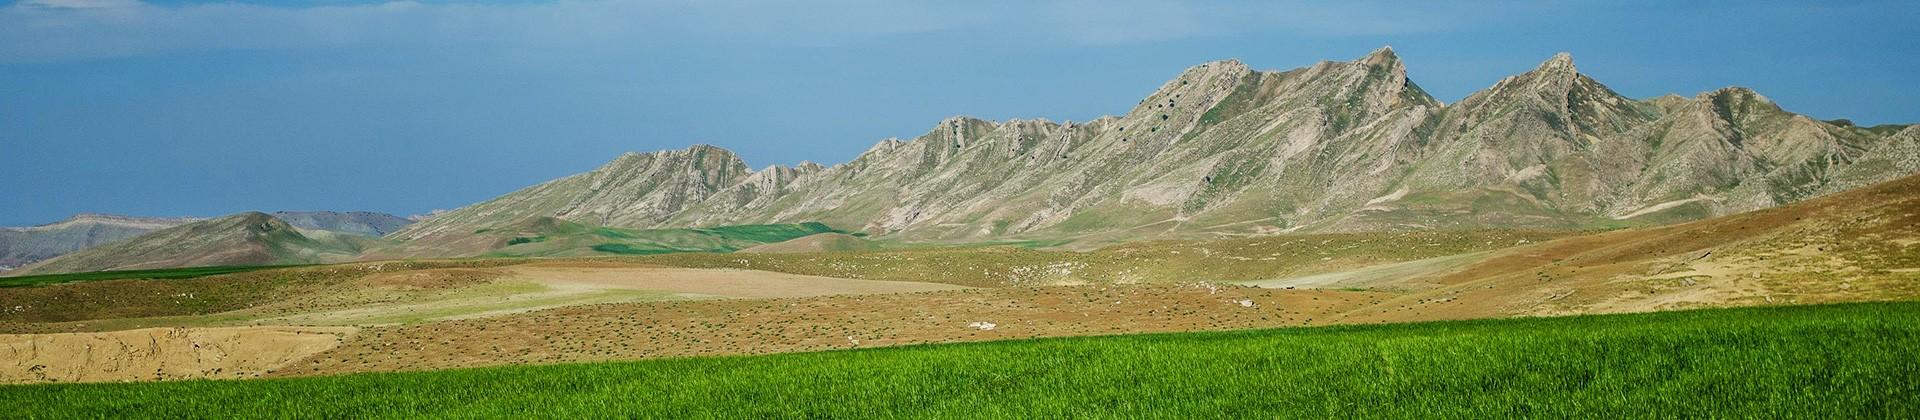 Amir Temur's Cave - 1